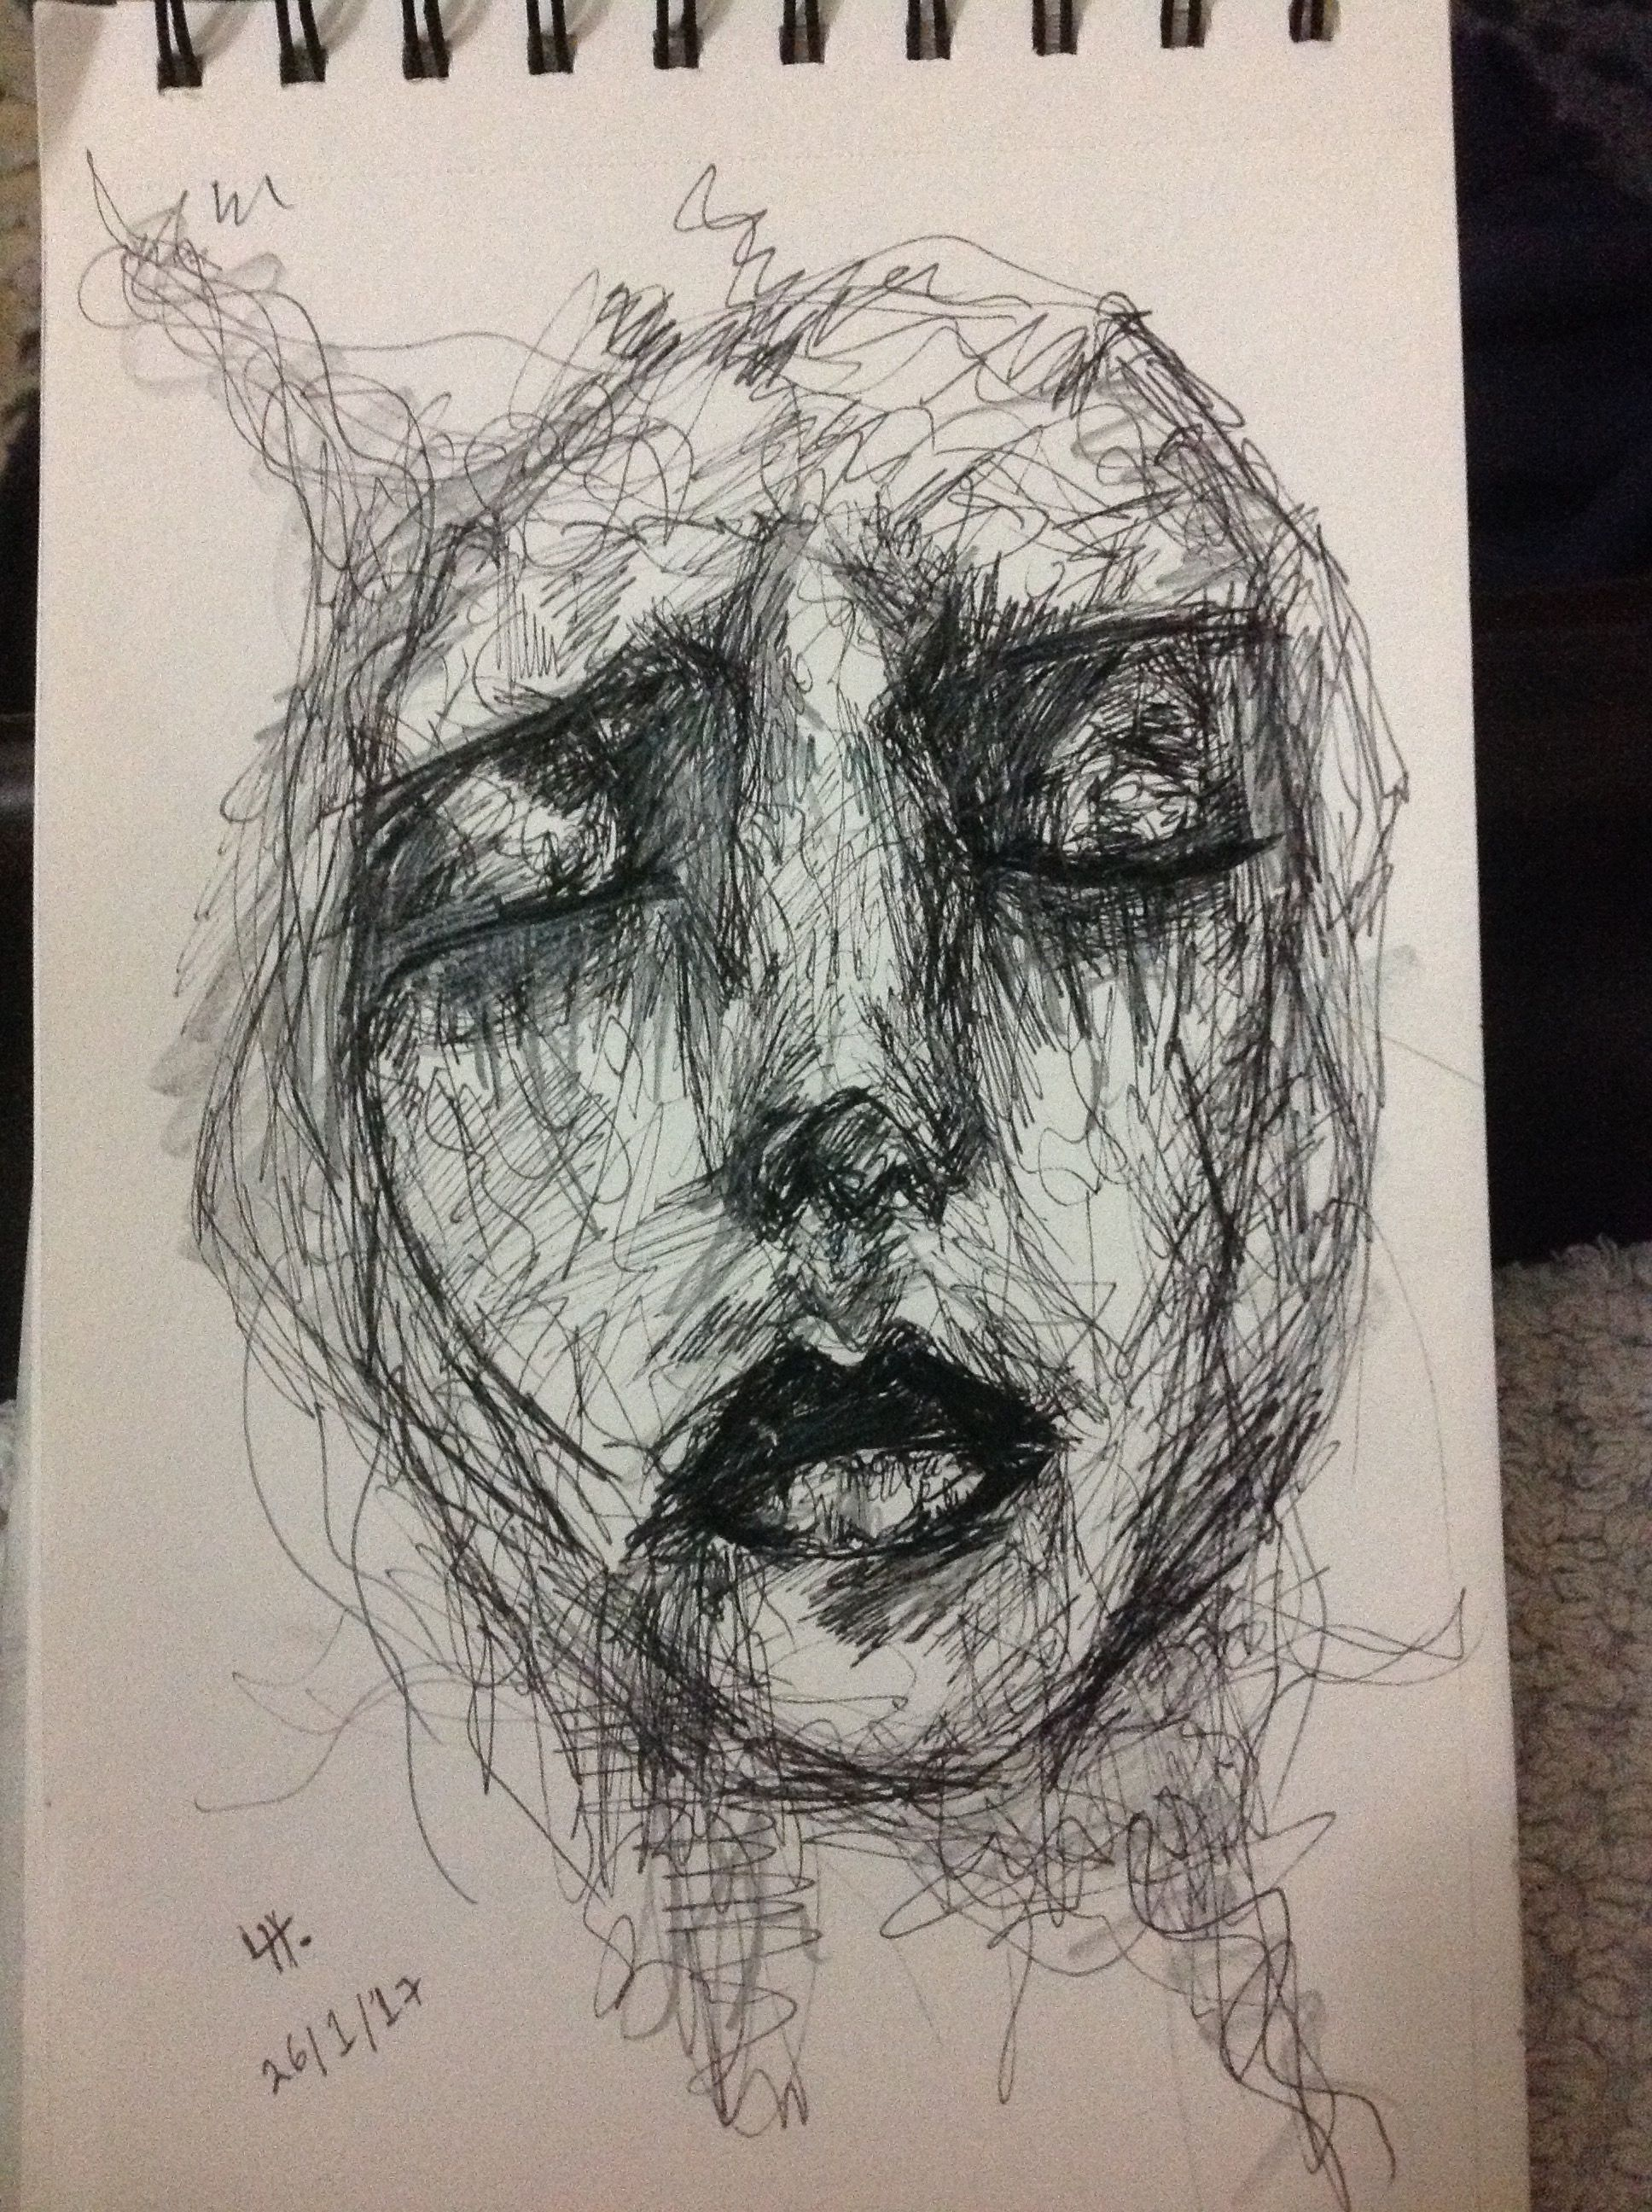 Line Drawing Of Sad Face : Depression sadness sketch pen depressed sadface help my